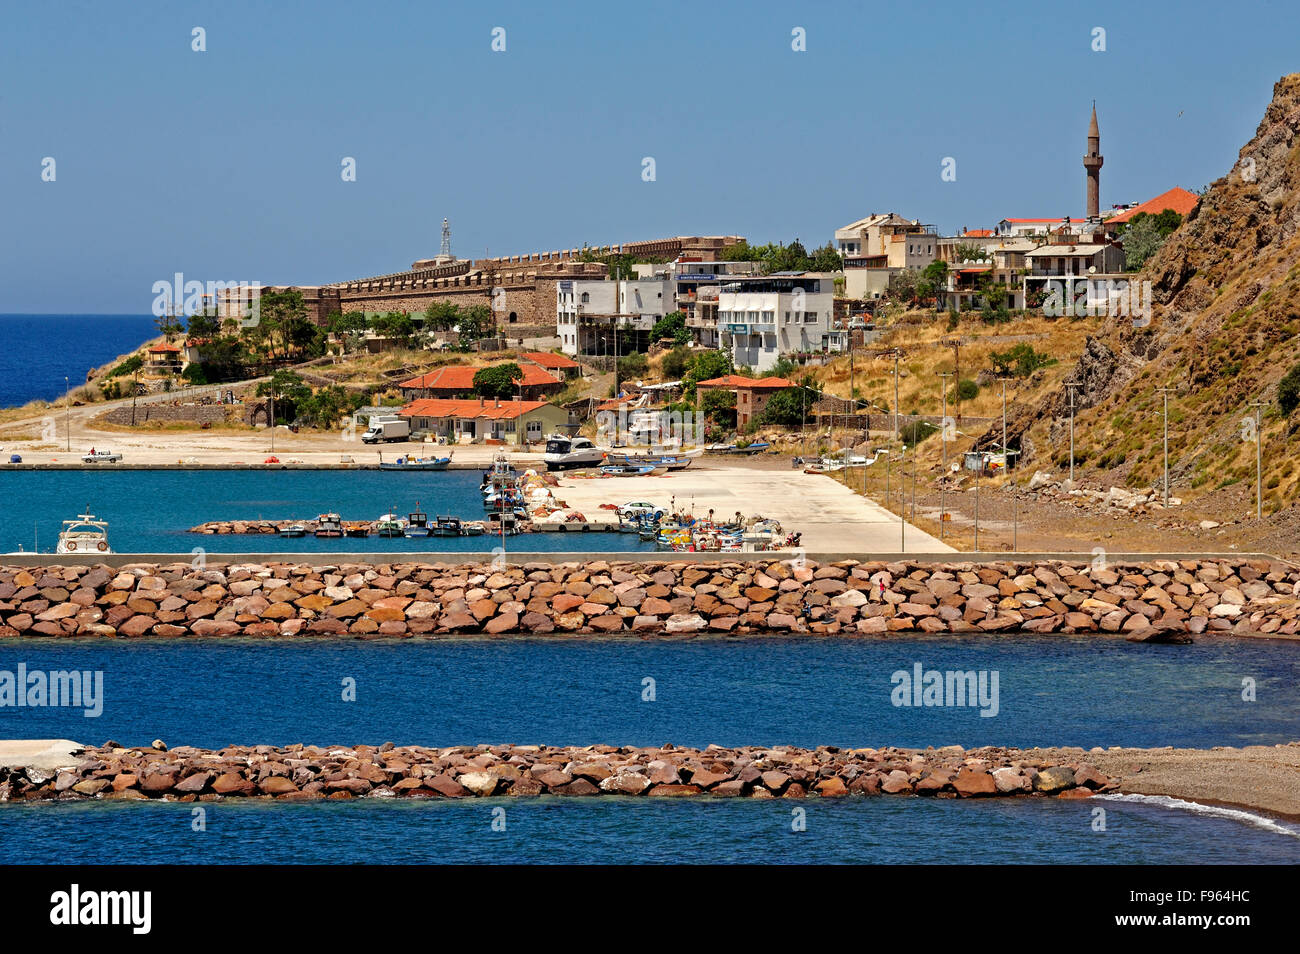 breakwaters and harbour, Babakale, Biga Peninsula, Turkey - Stock Image